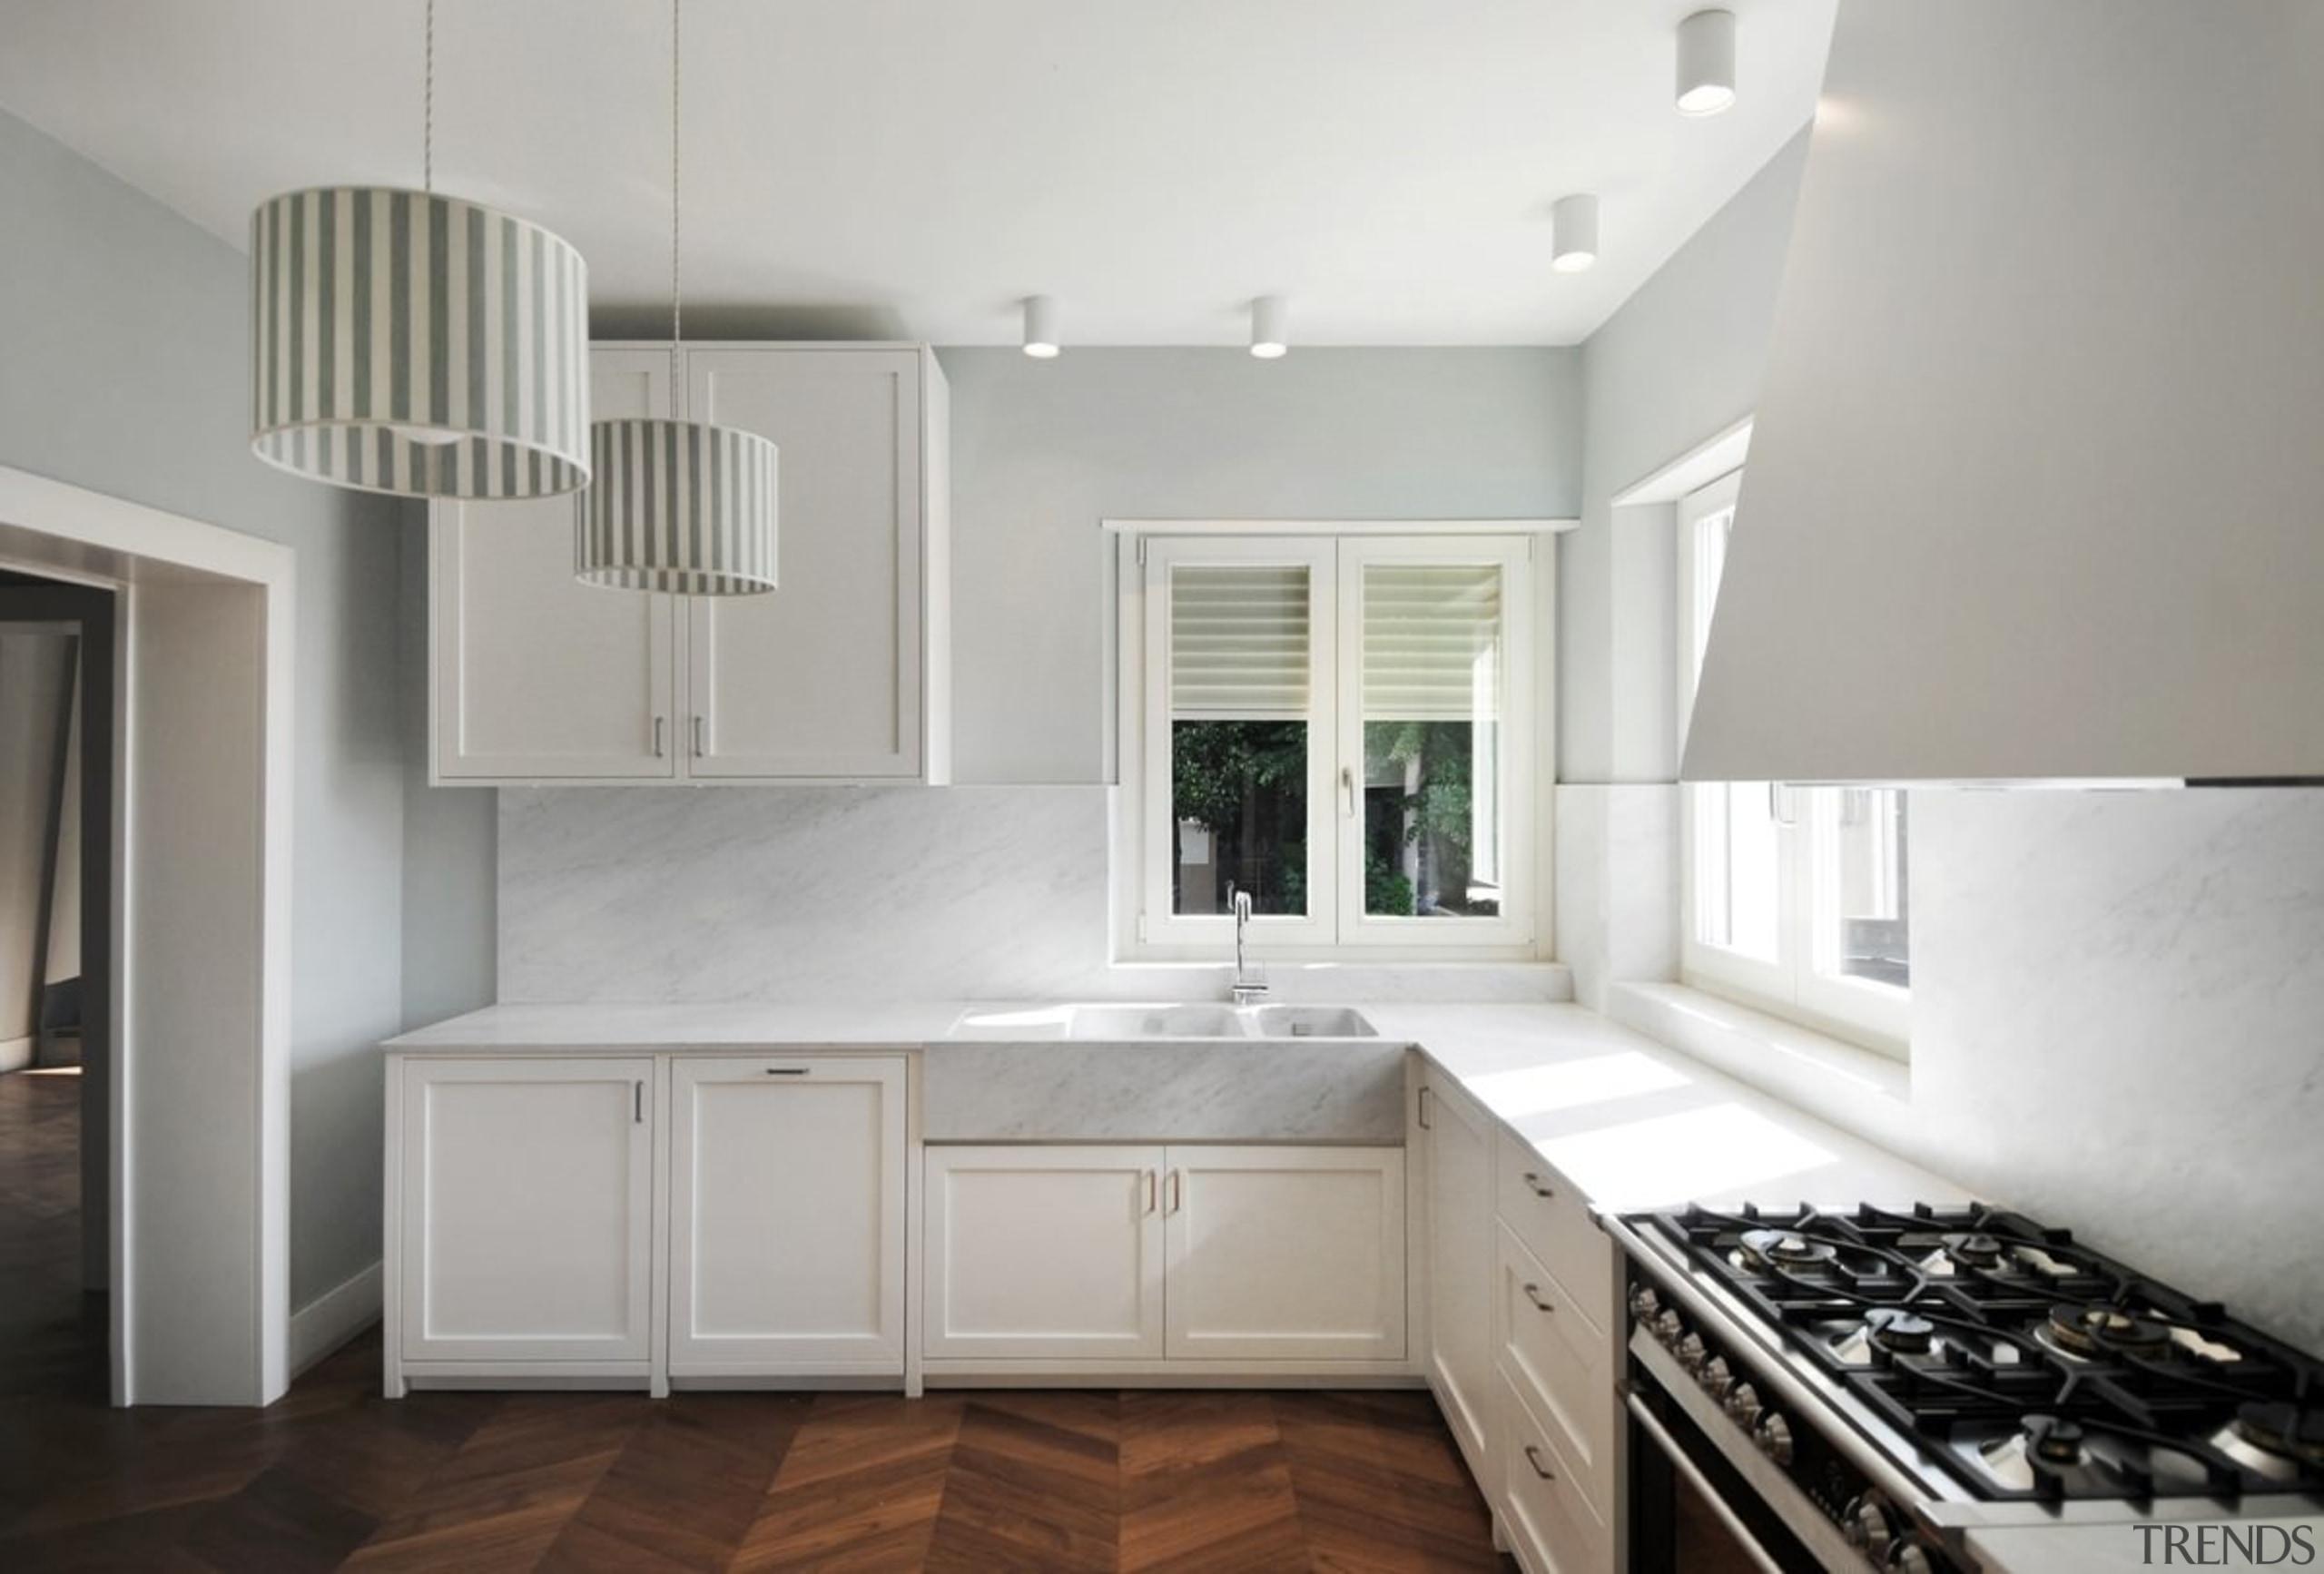 Architect: Tisselli Studio ArchitettiPhotography by Filippo Tisselli cabinetry, countertop, cuisine classique, daylighting, floor, home, interior design, kitchen, property, real estate, room, window, gray